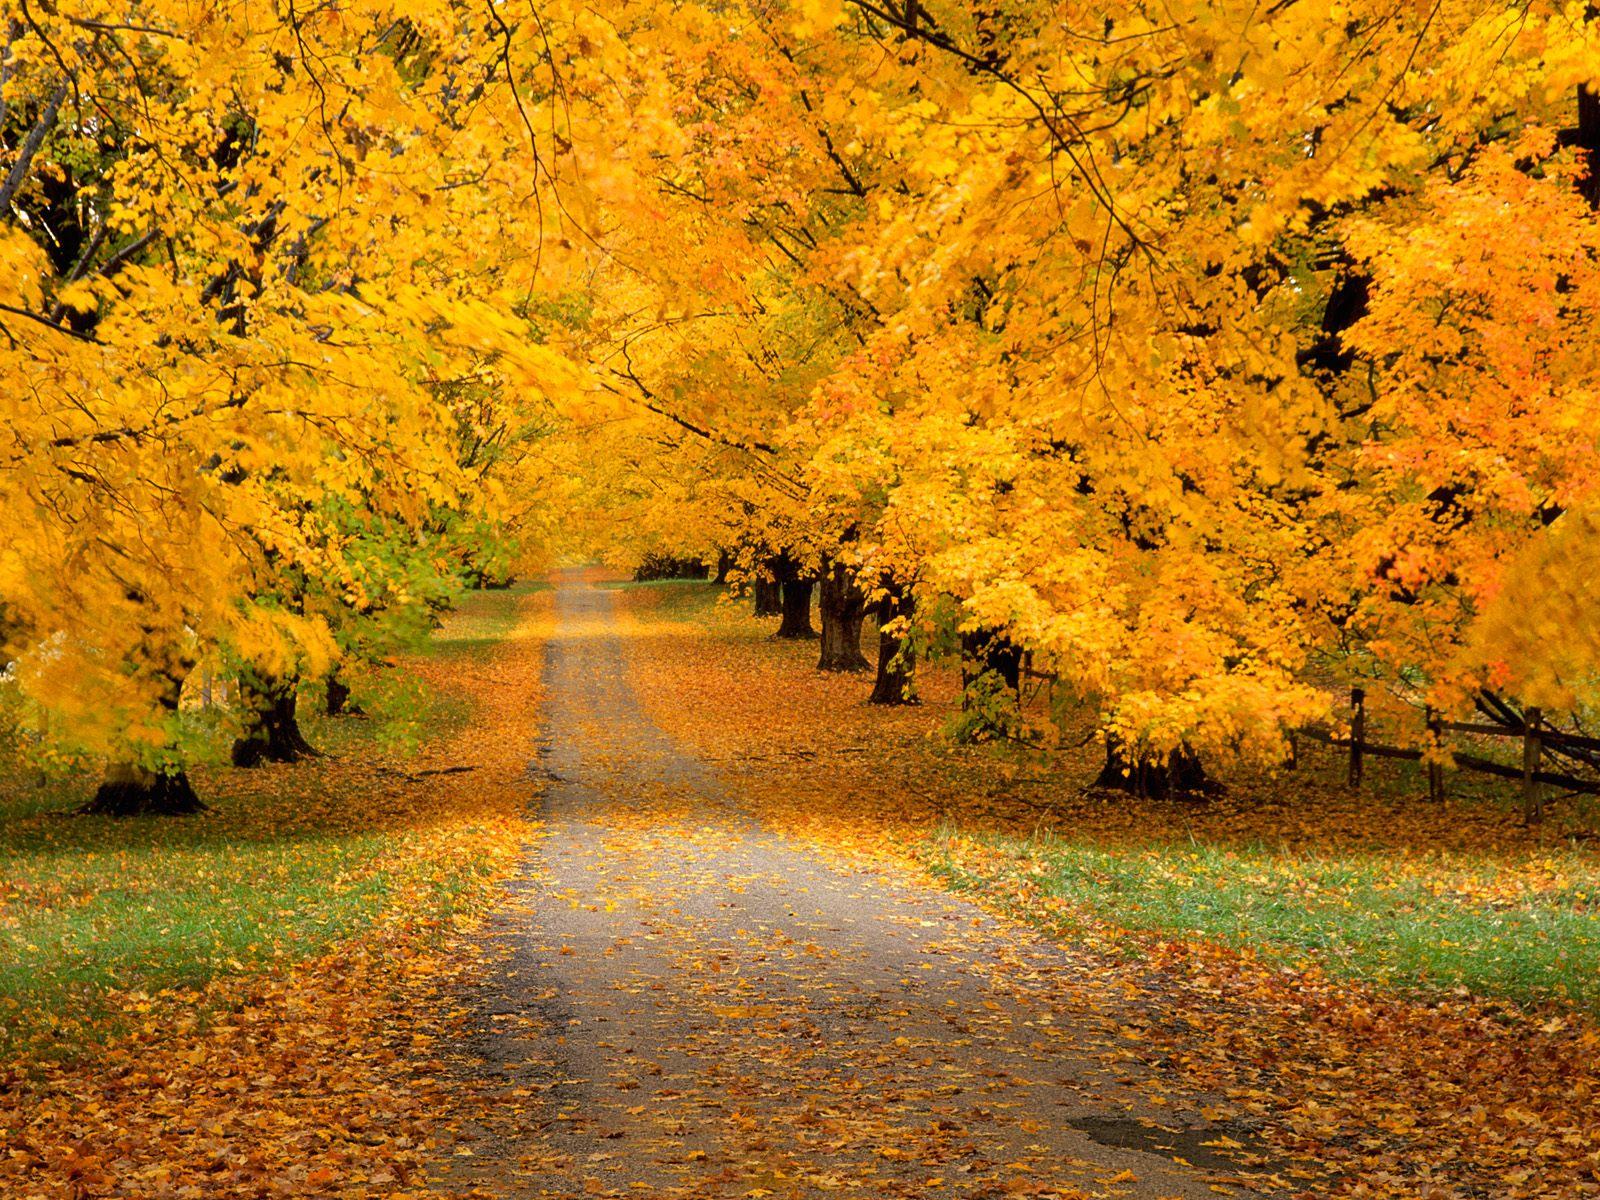 autumn desktop background autumn desktop backgrounds Desktop 1600x1200